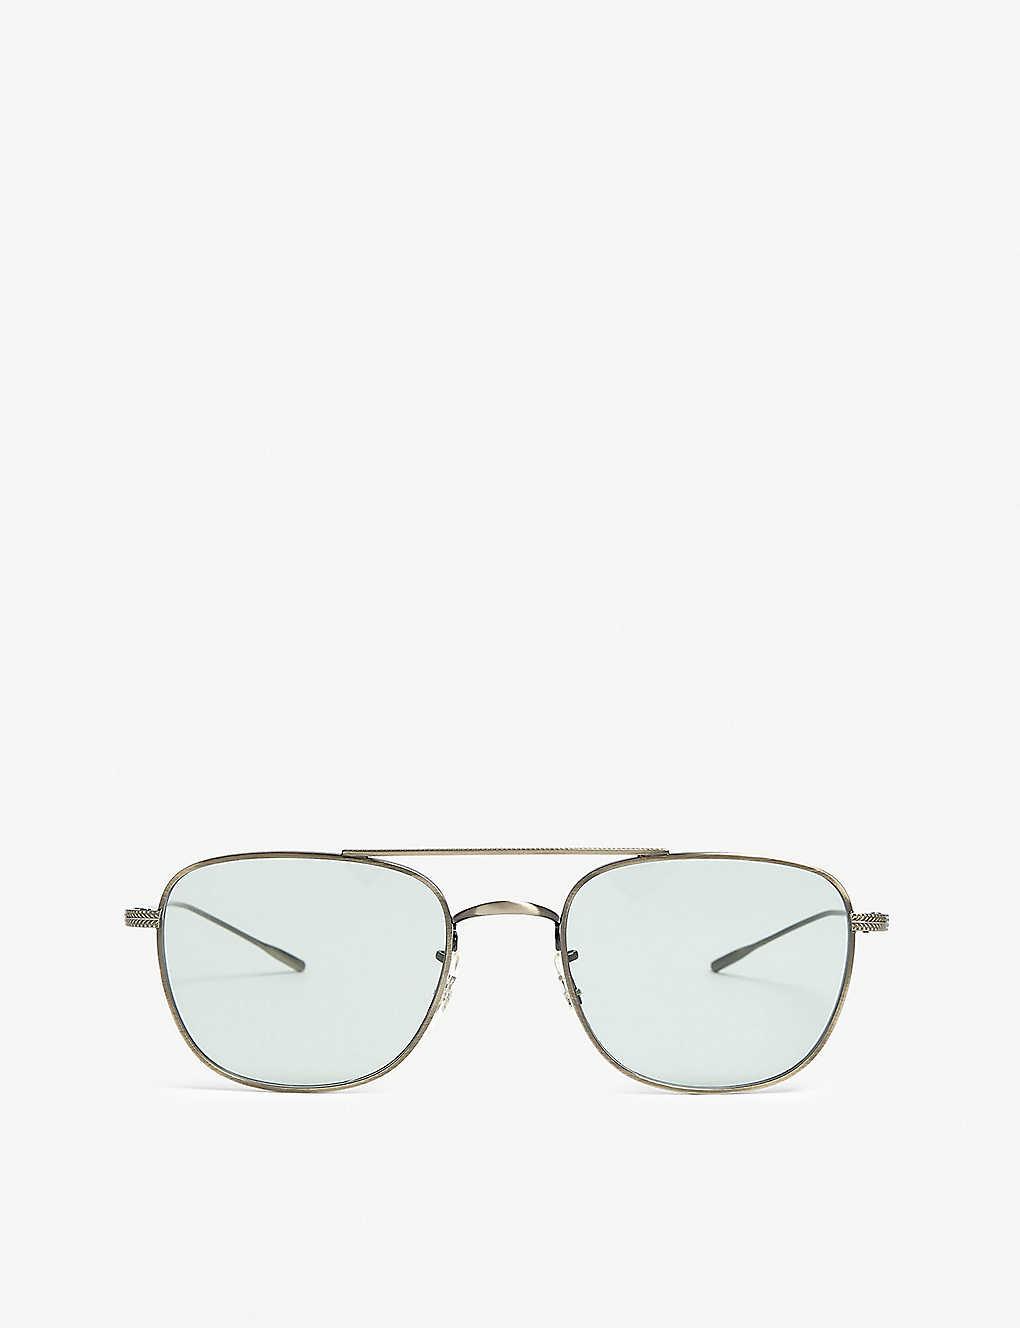 d69d22fad0 OLIVER PEOPLES - Kress aviator glasses